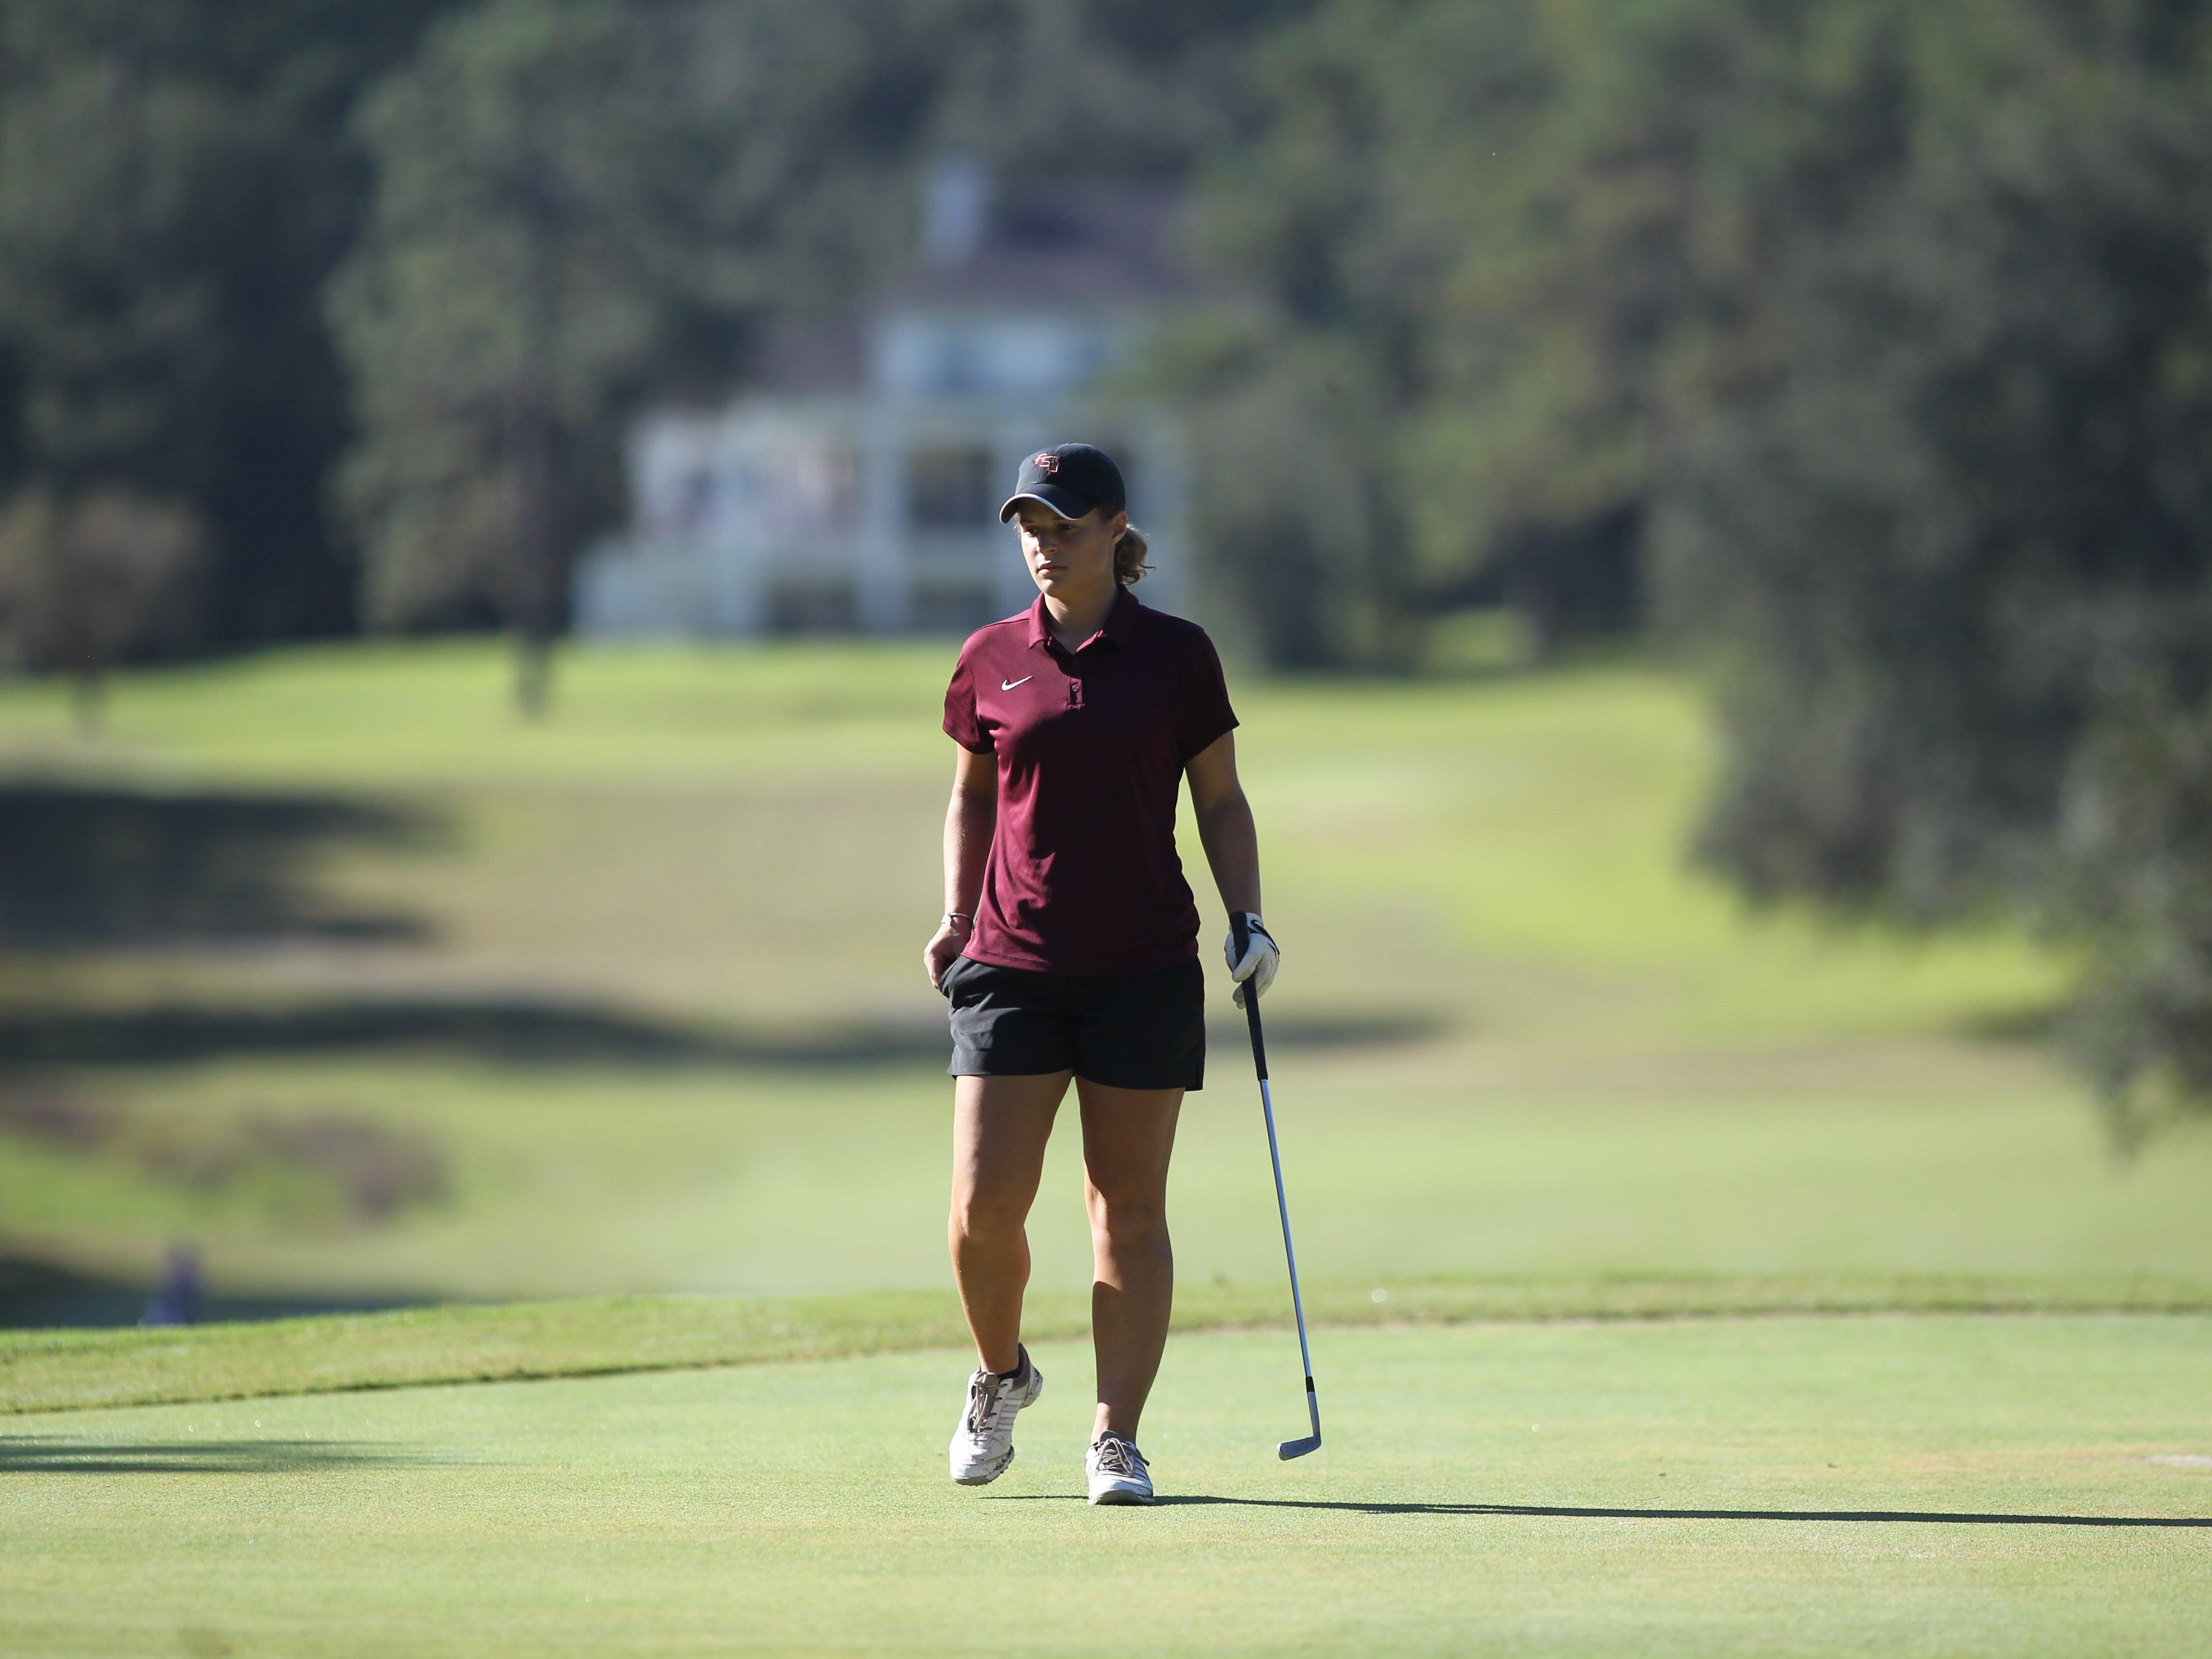 Florida High junior Savannah Bonn plays in the girls golf Panhandle Invitational at Killearn Country Club, Oct. 4, 2018.